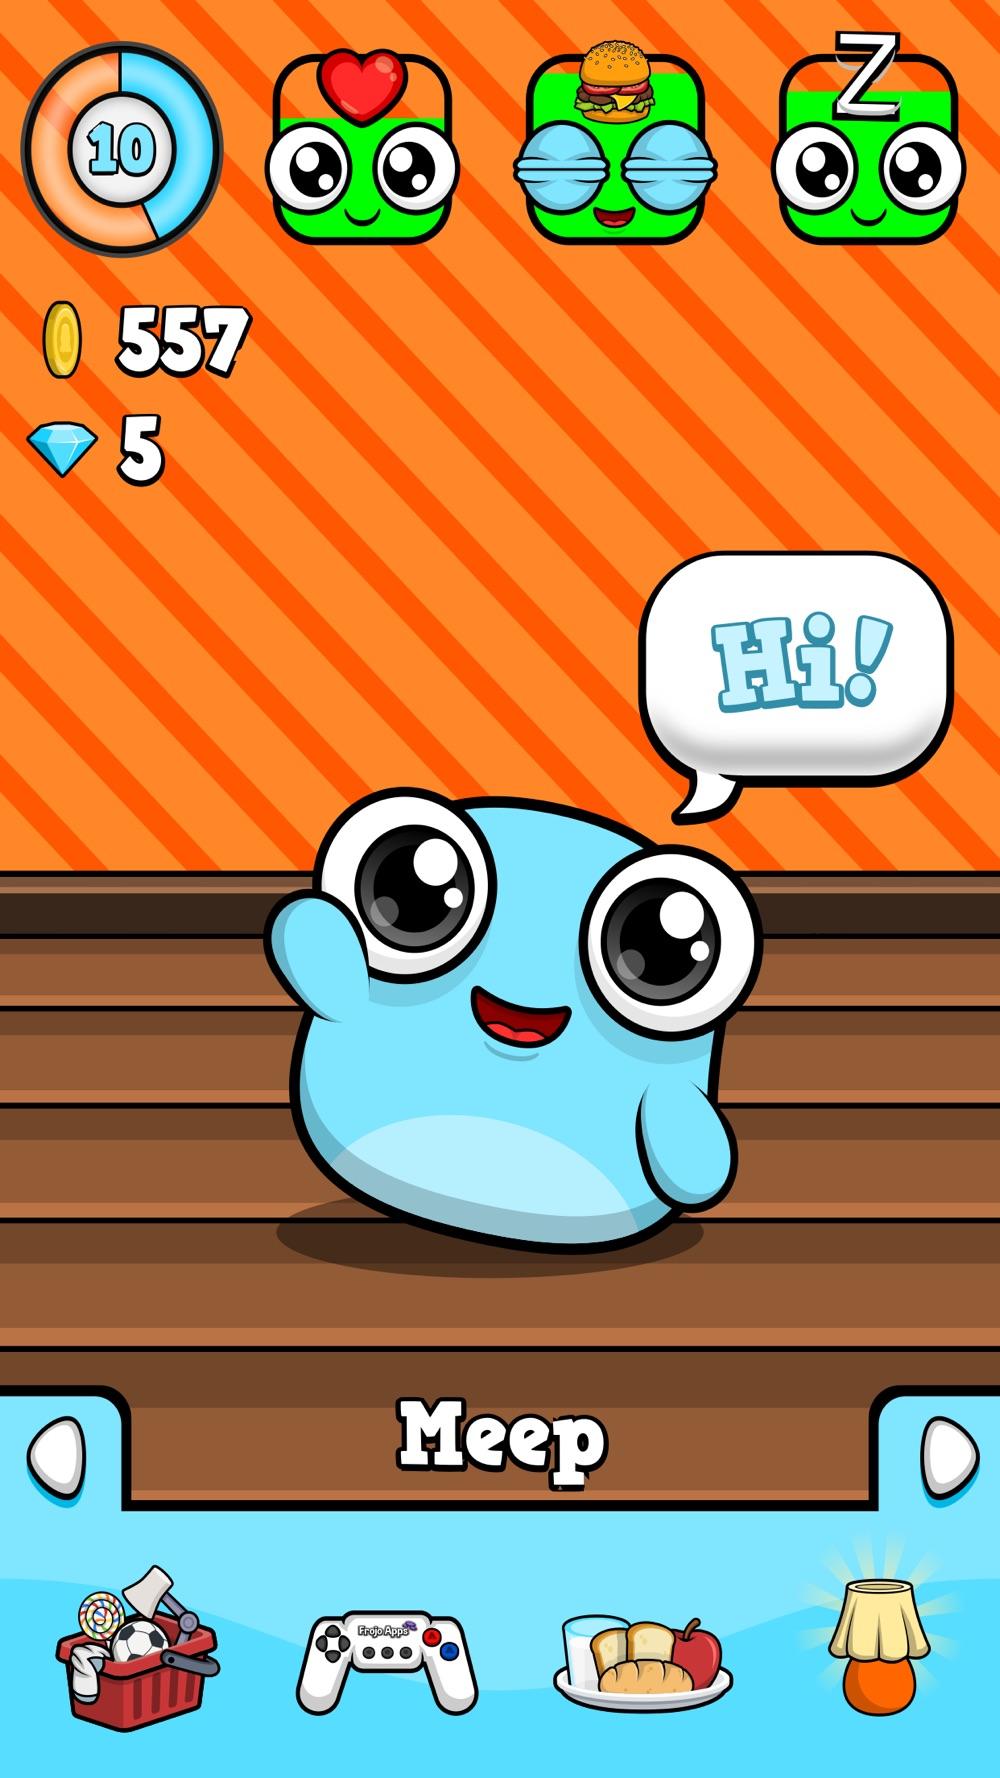 Meep - Virtual Pet Game hack tool